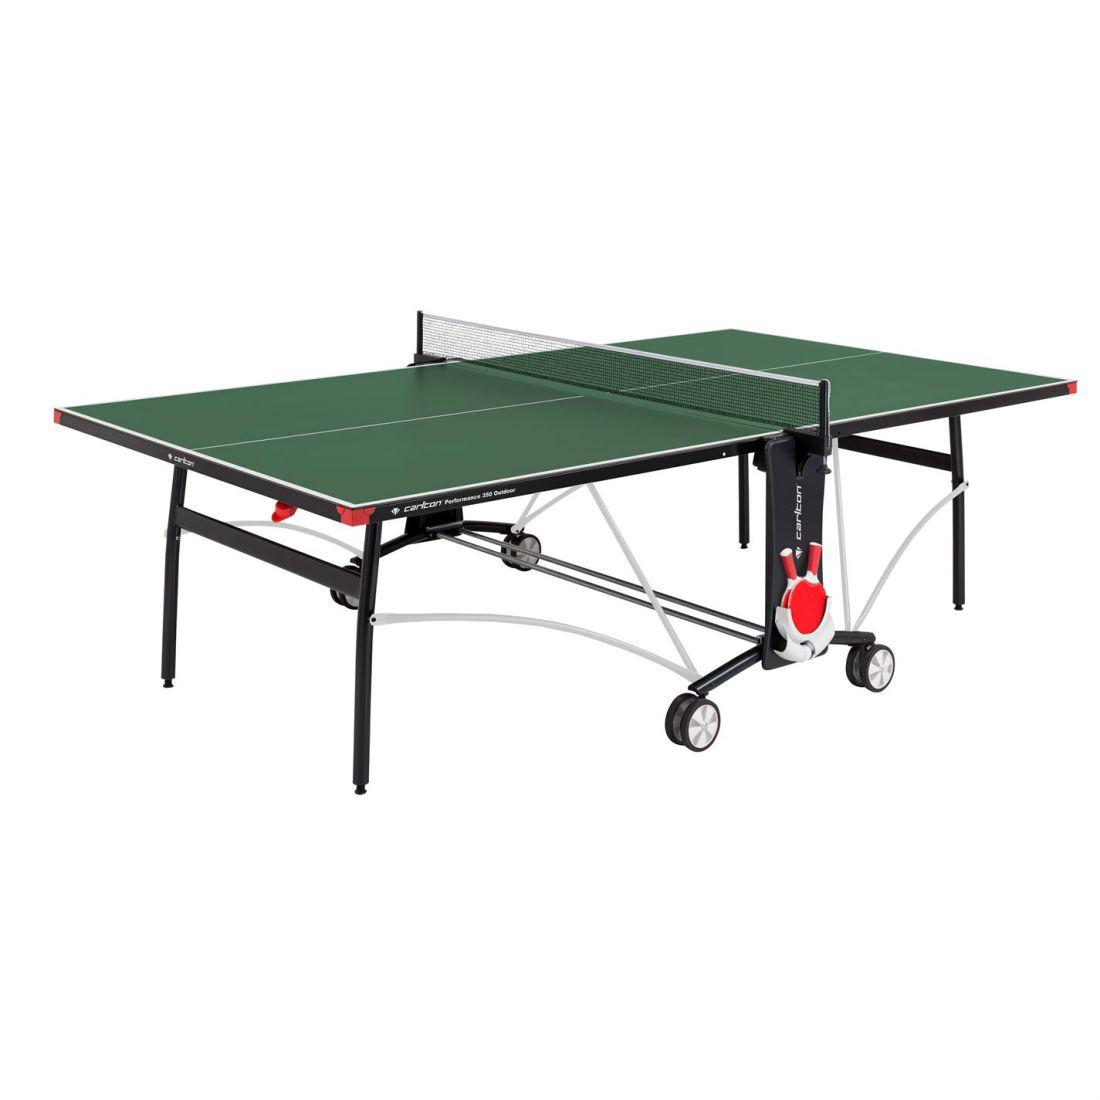 Image Is Loading Automobilelton Performance 350 Outside Table Tennis Uni Tables